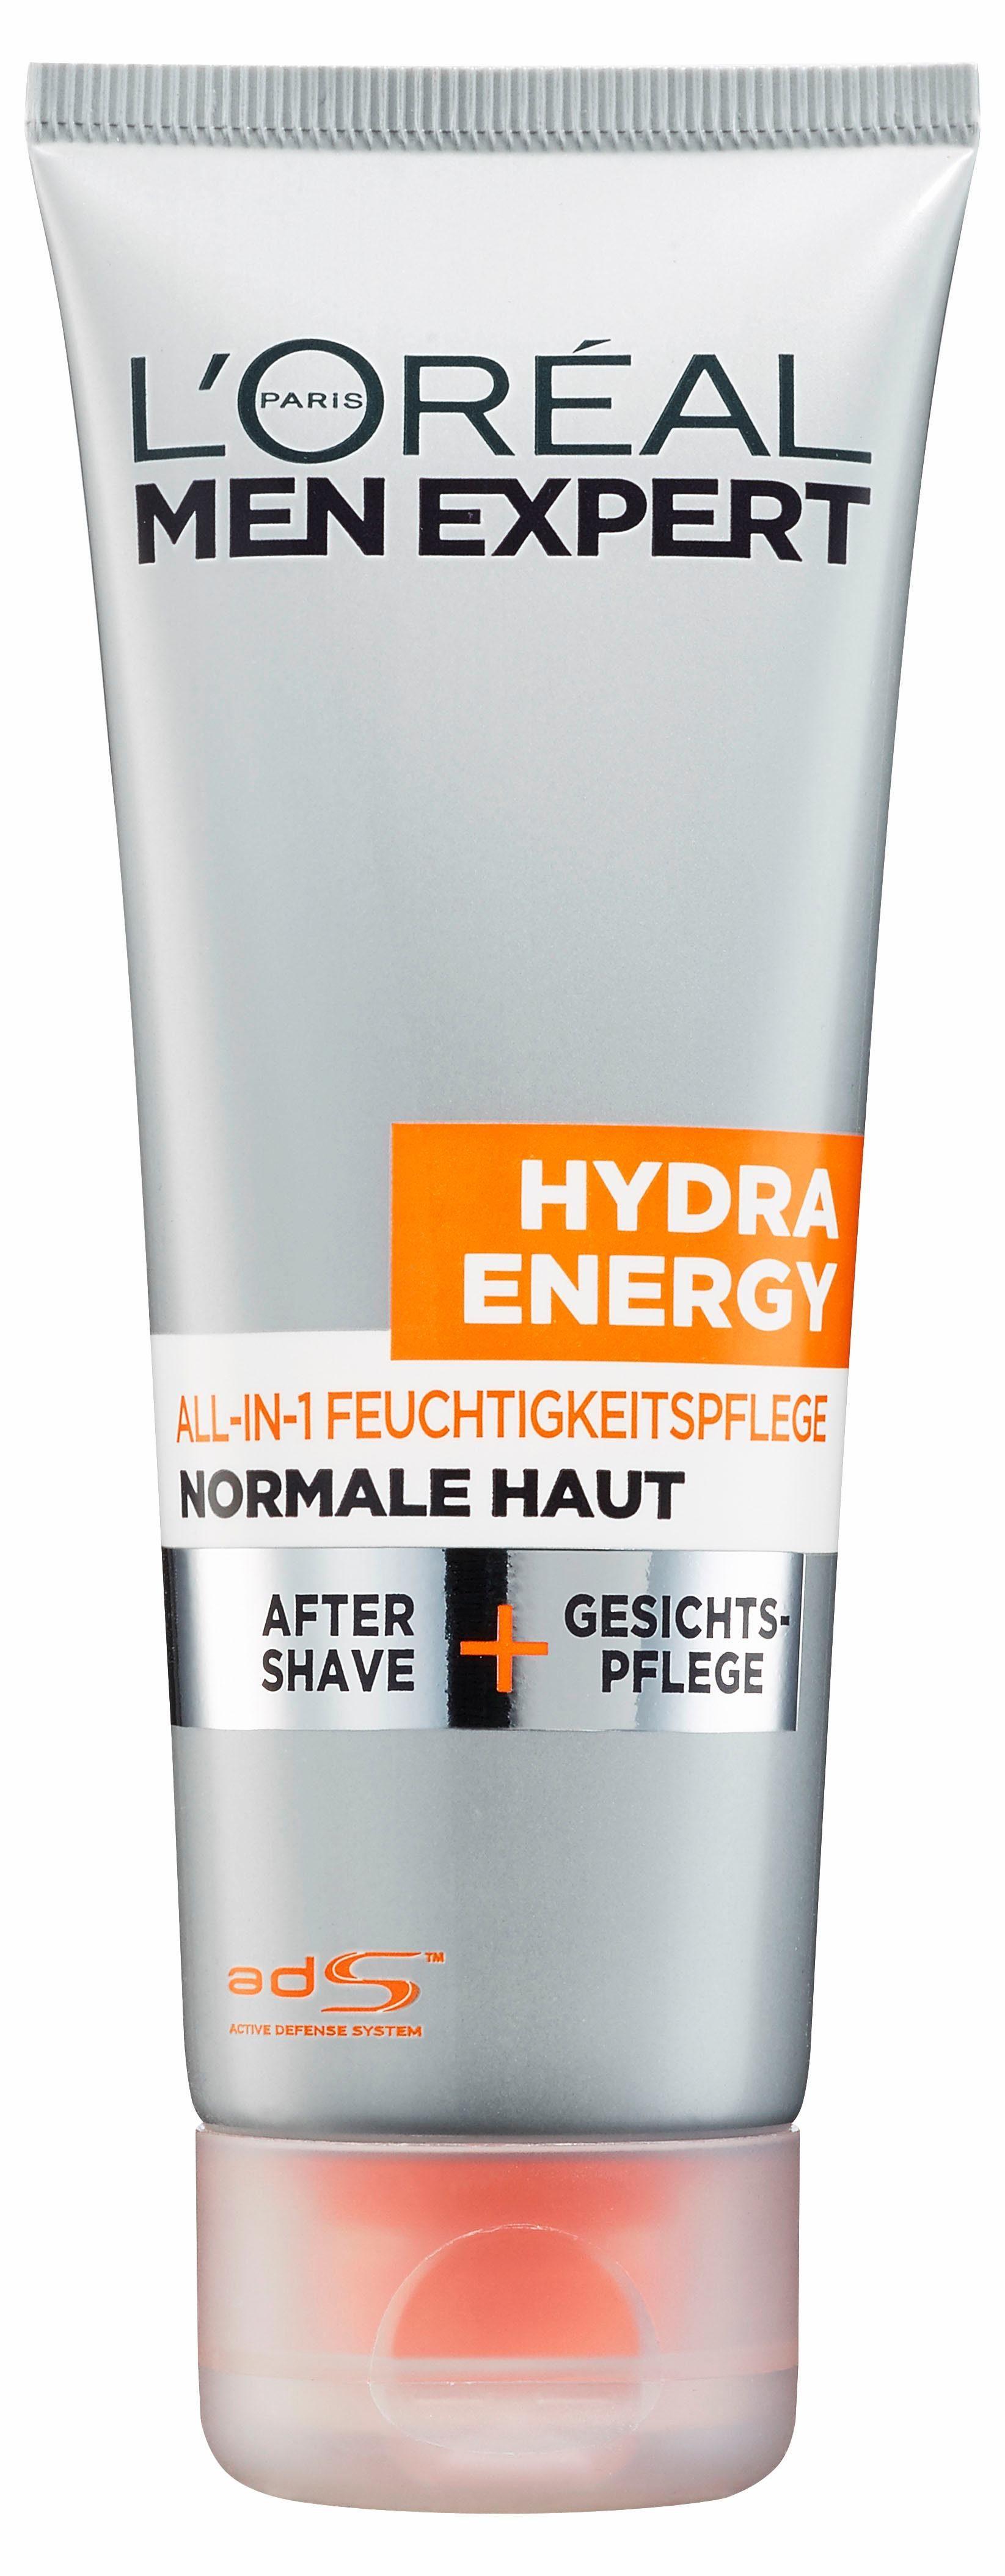 L'Oréal Paris Men Expert, »Hydra Energy All-in-1 Feuchtigkeitspflege«, After Shave + Gesichtspflege, 75 ml